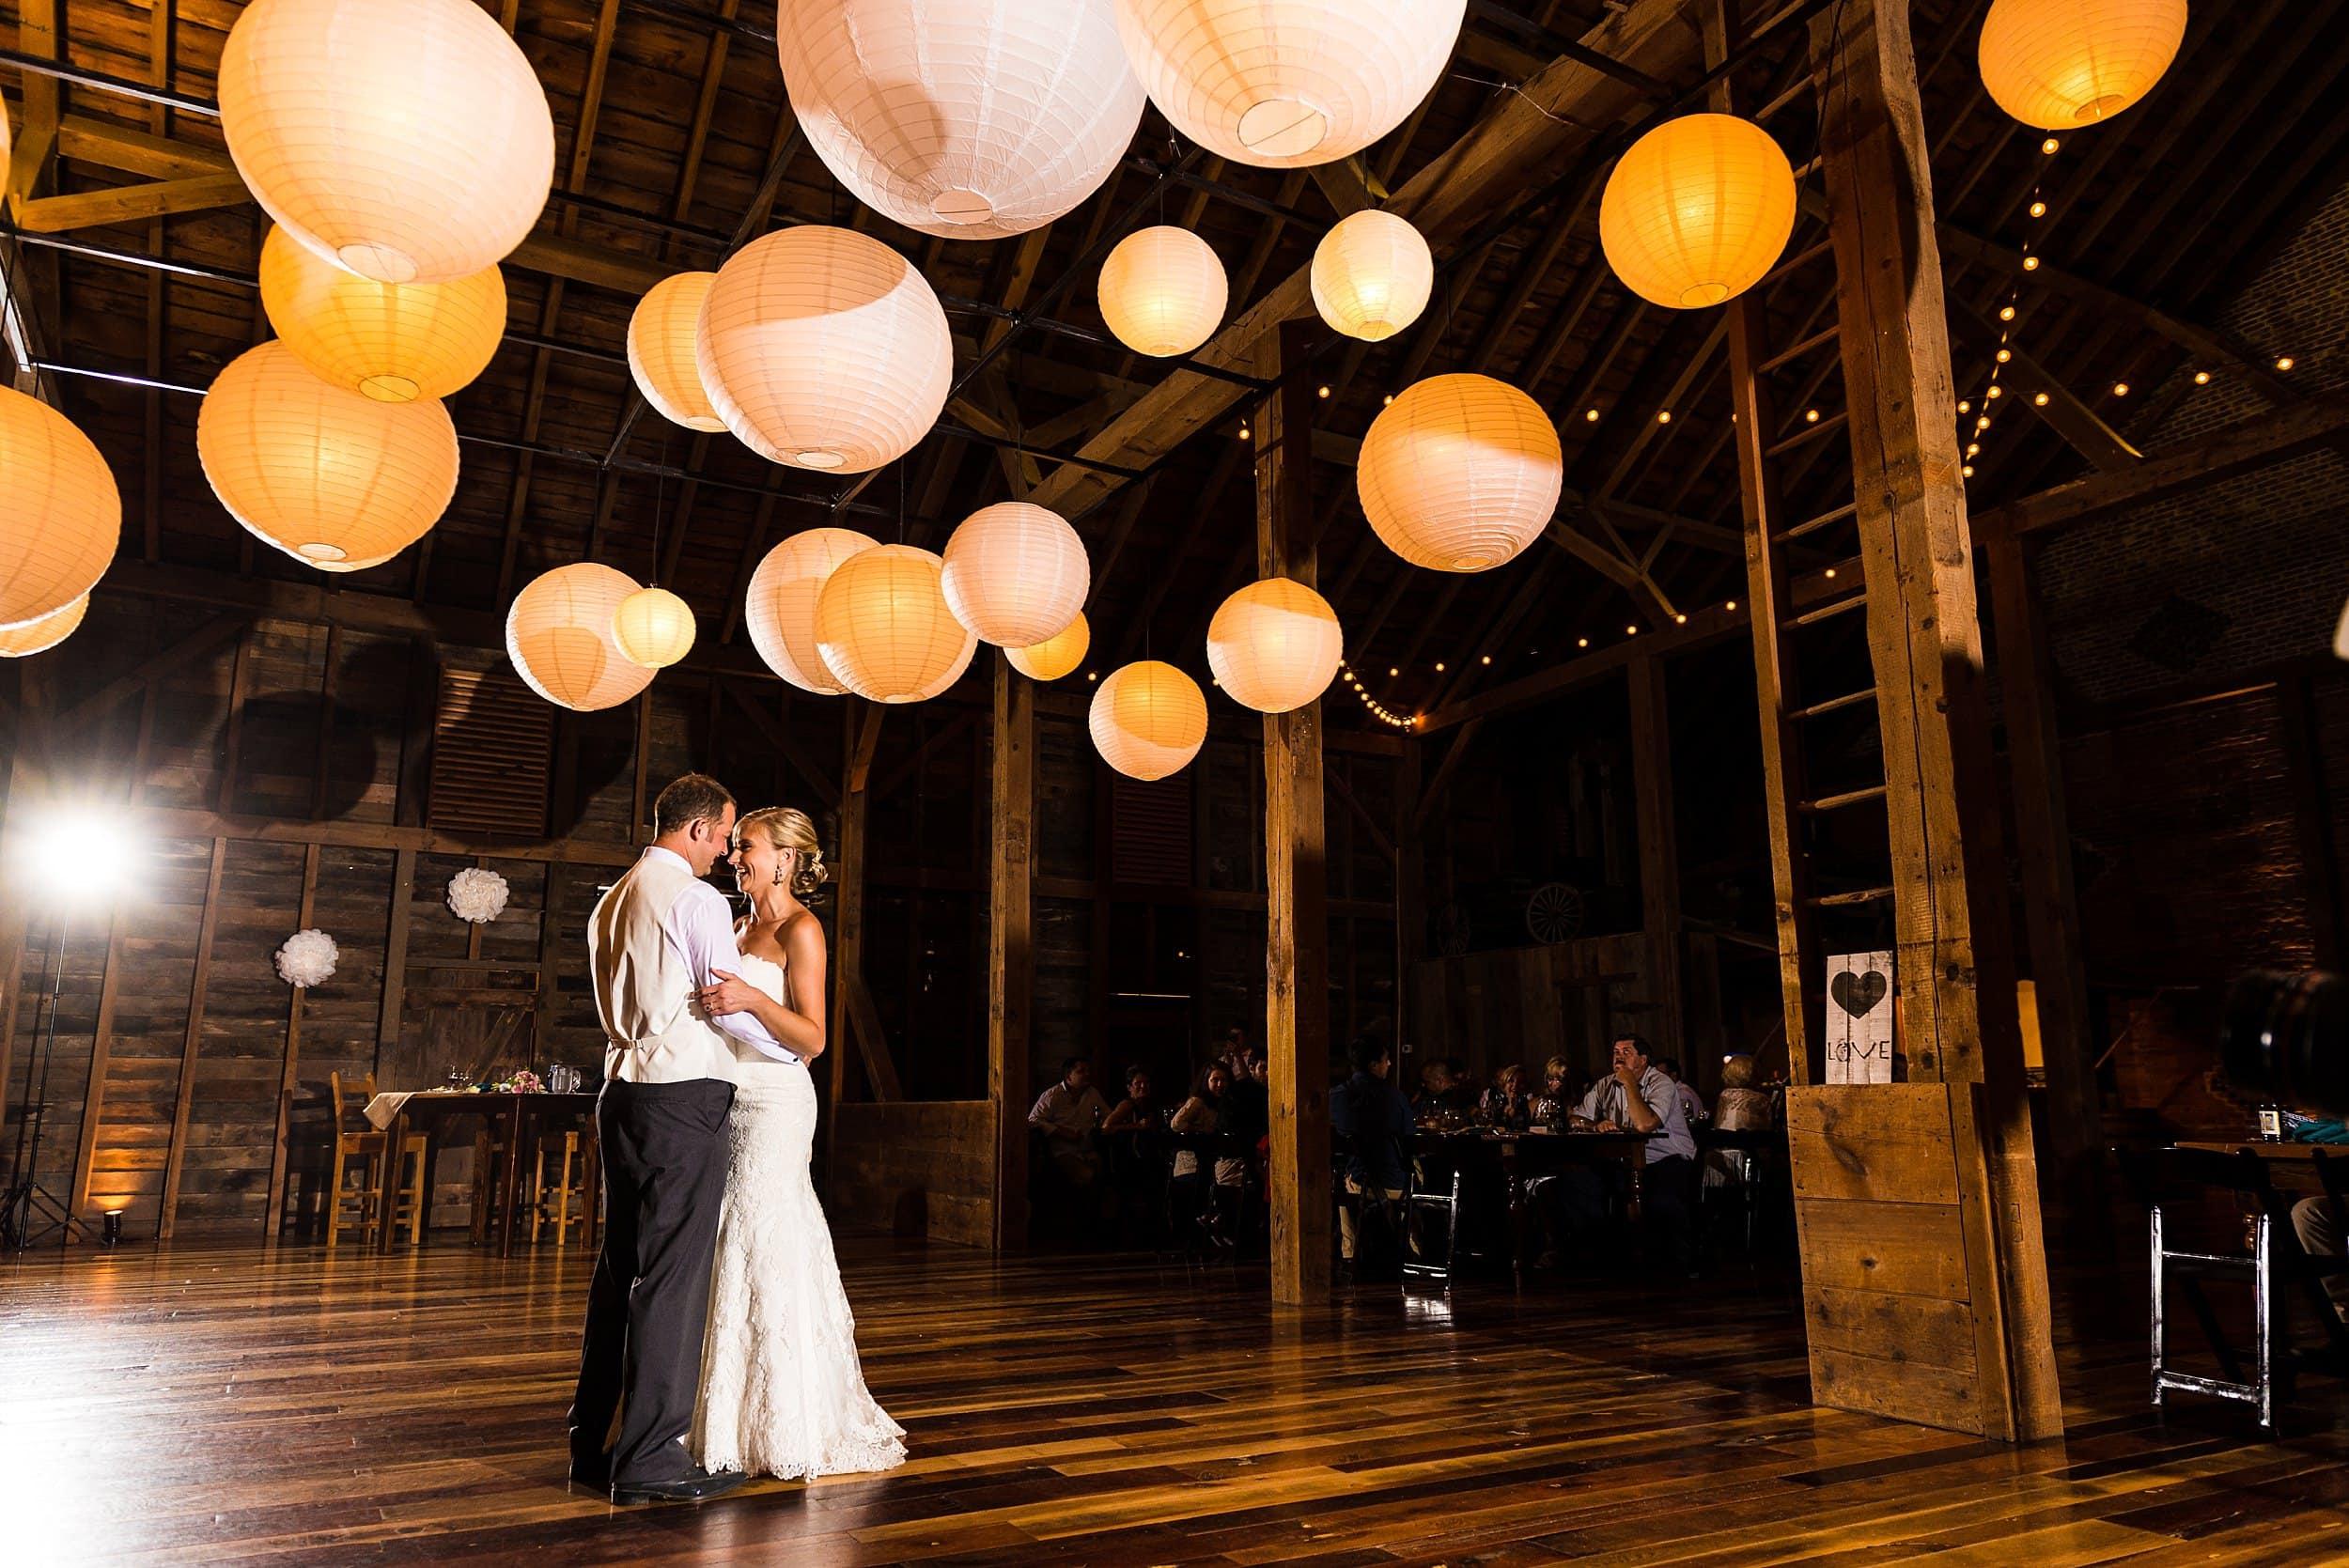 country barn wedding smj photography